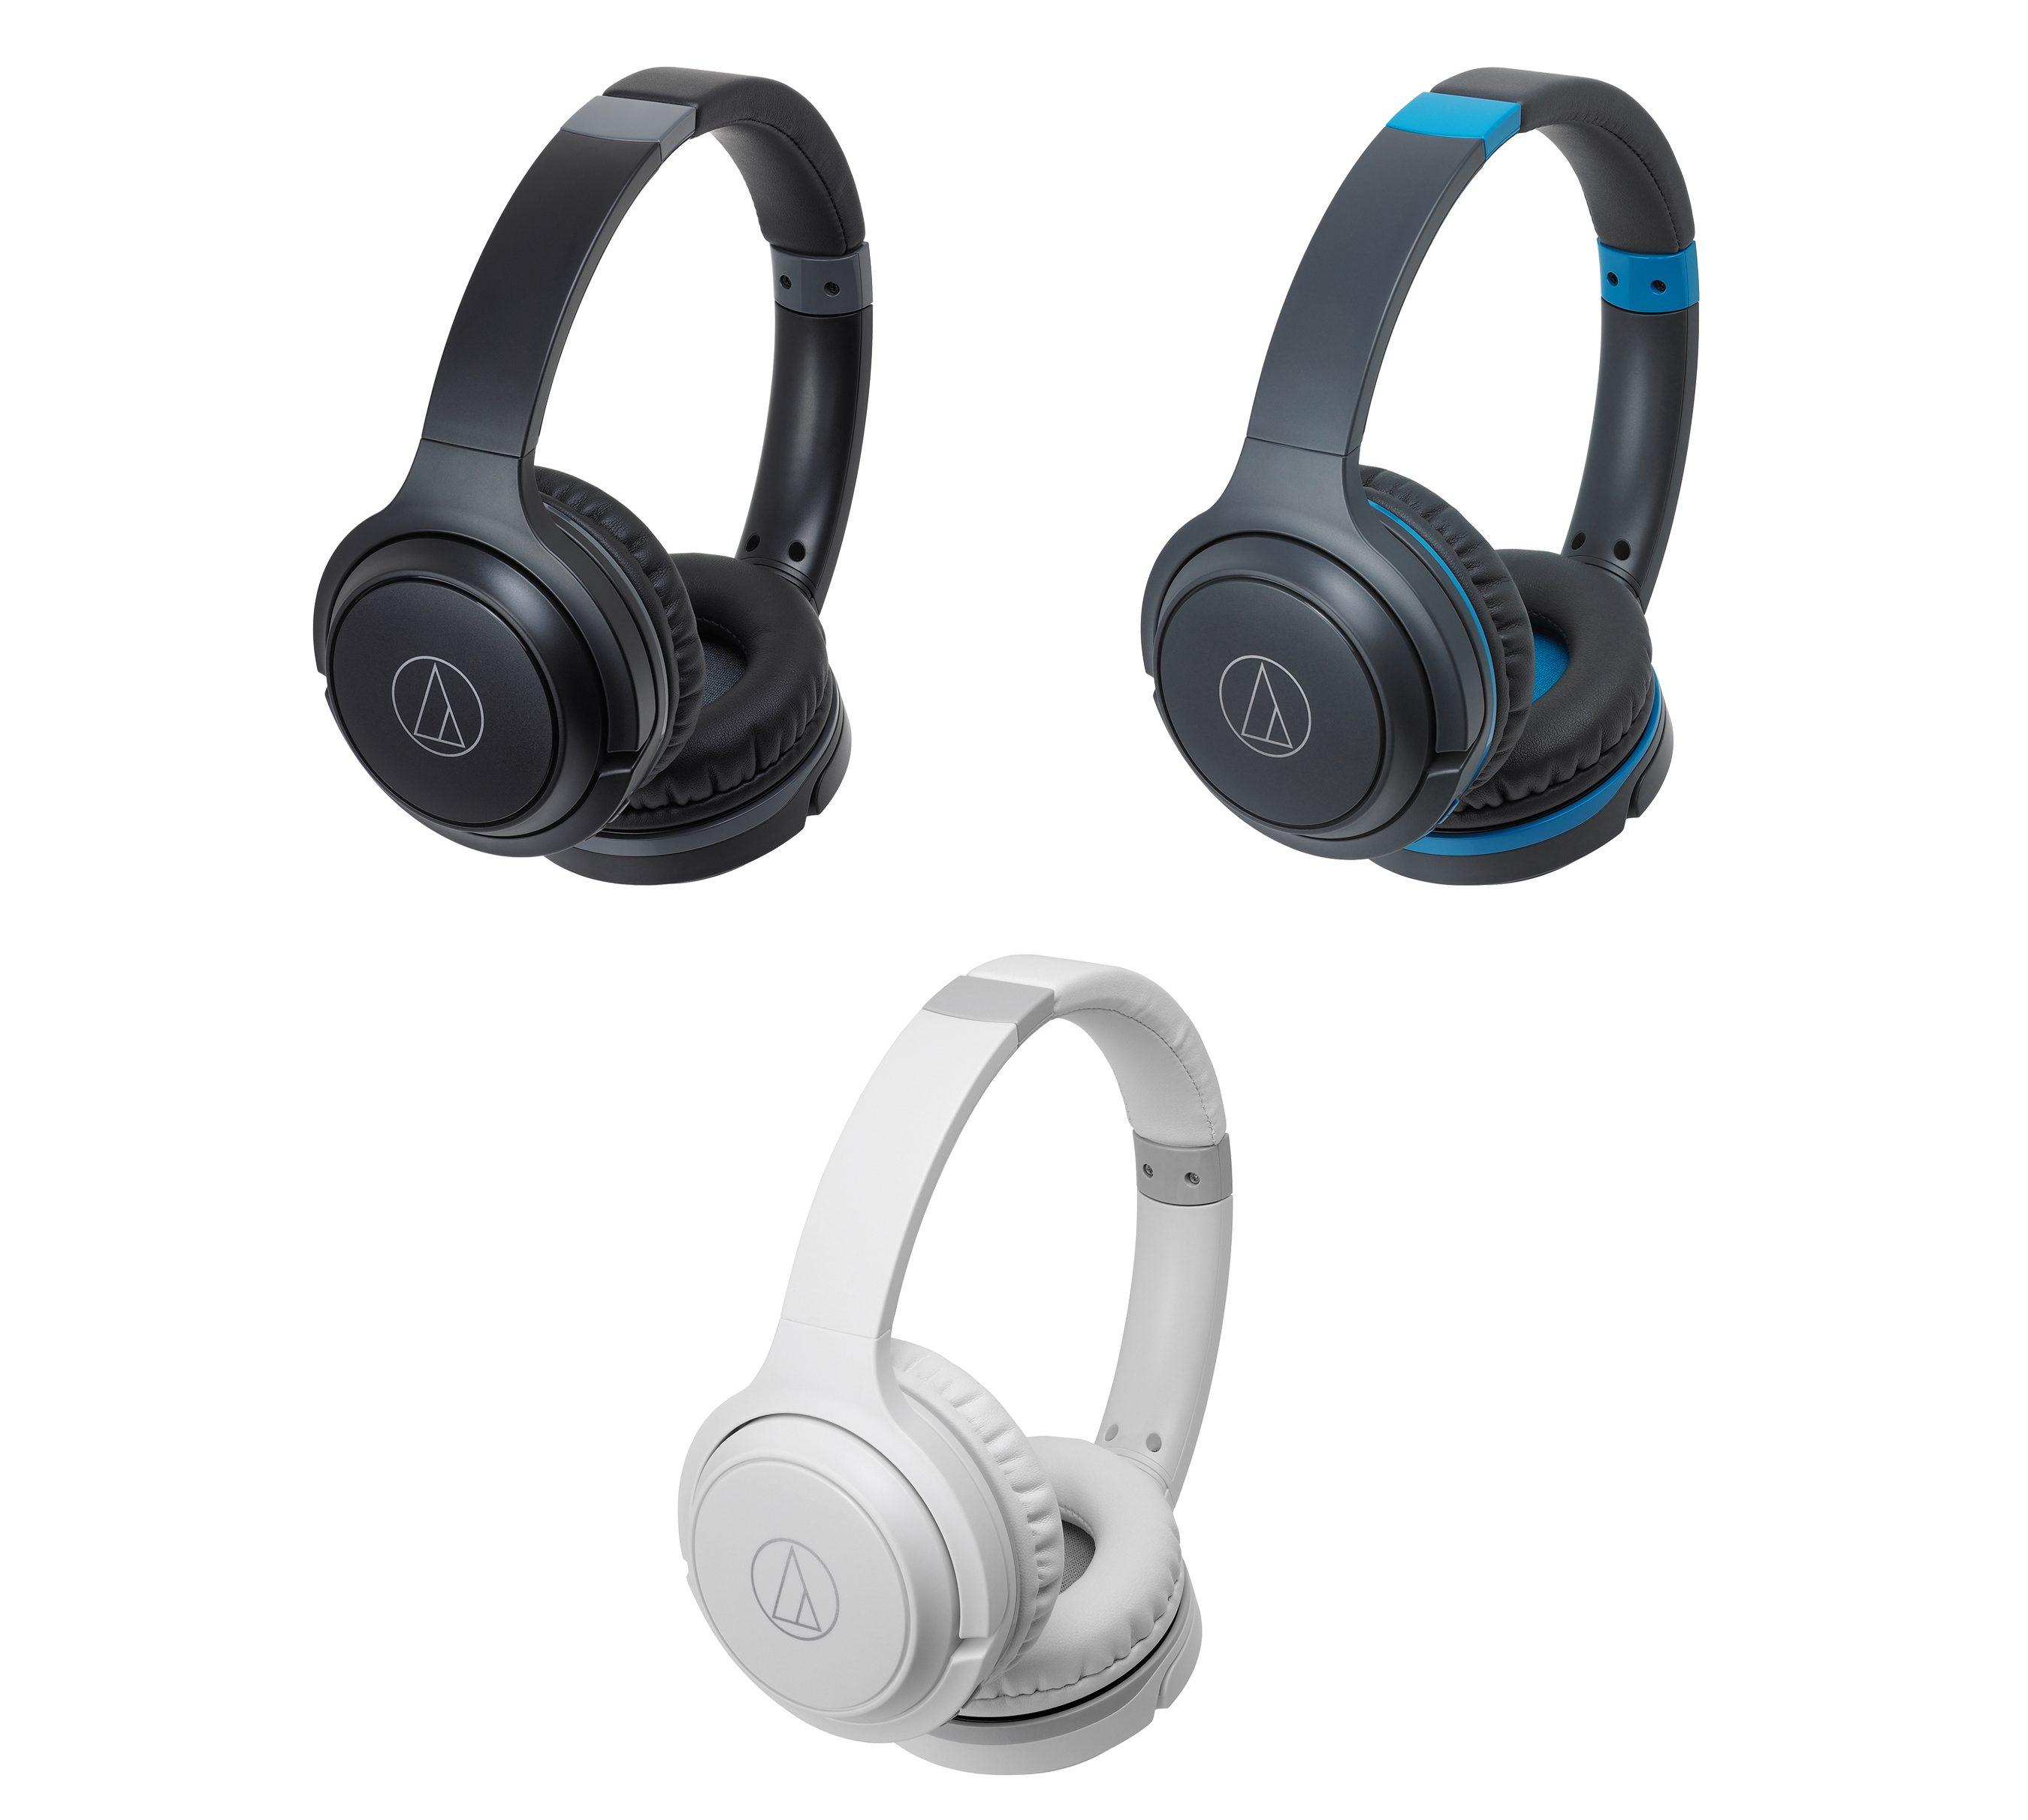 Tai nghe Audio Technica ATH-S200BTBK (Đen)